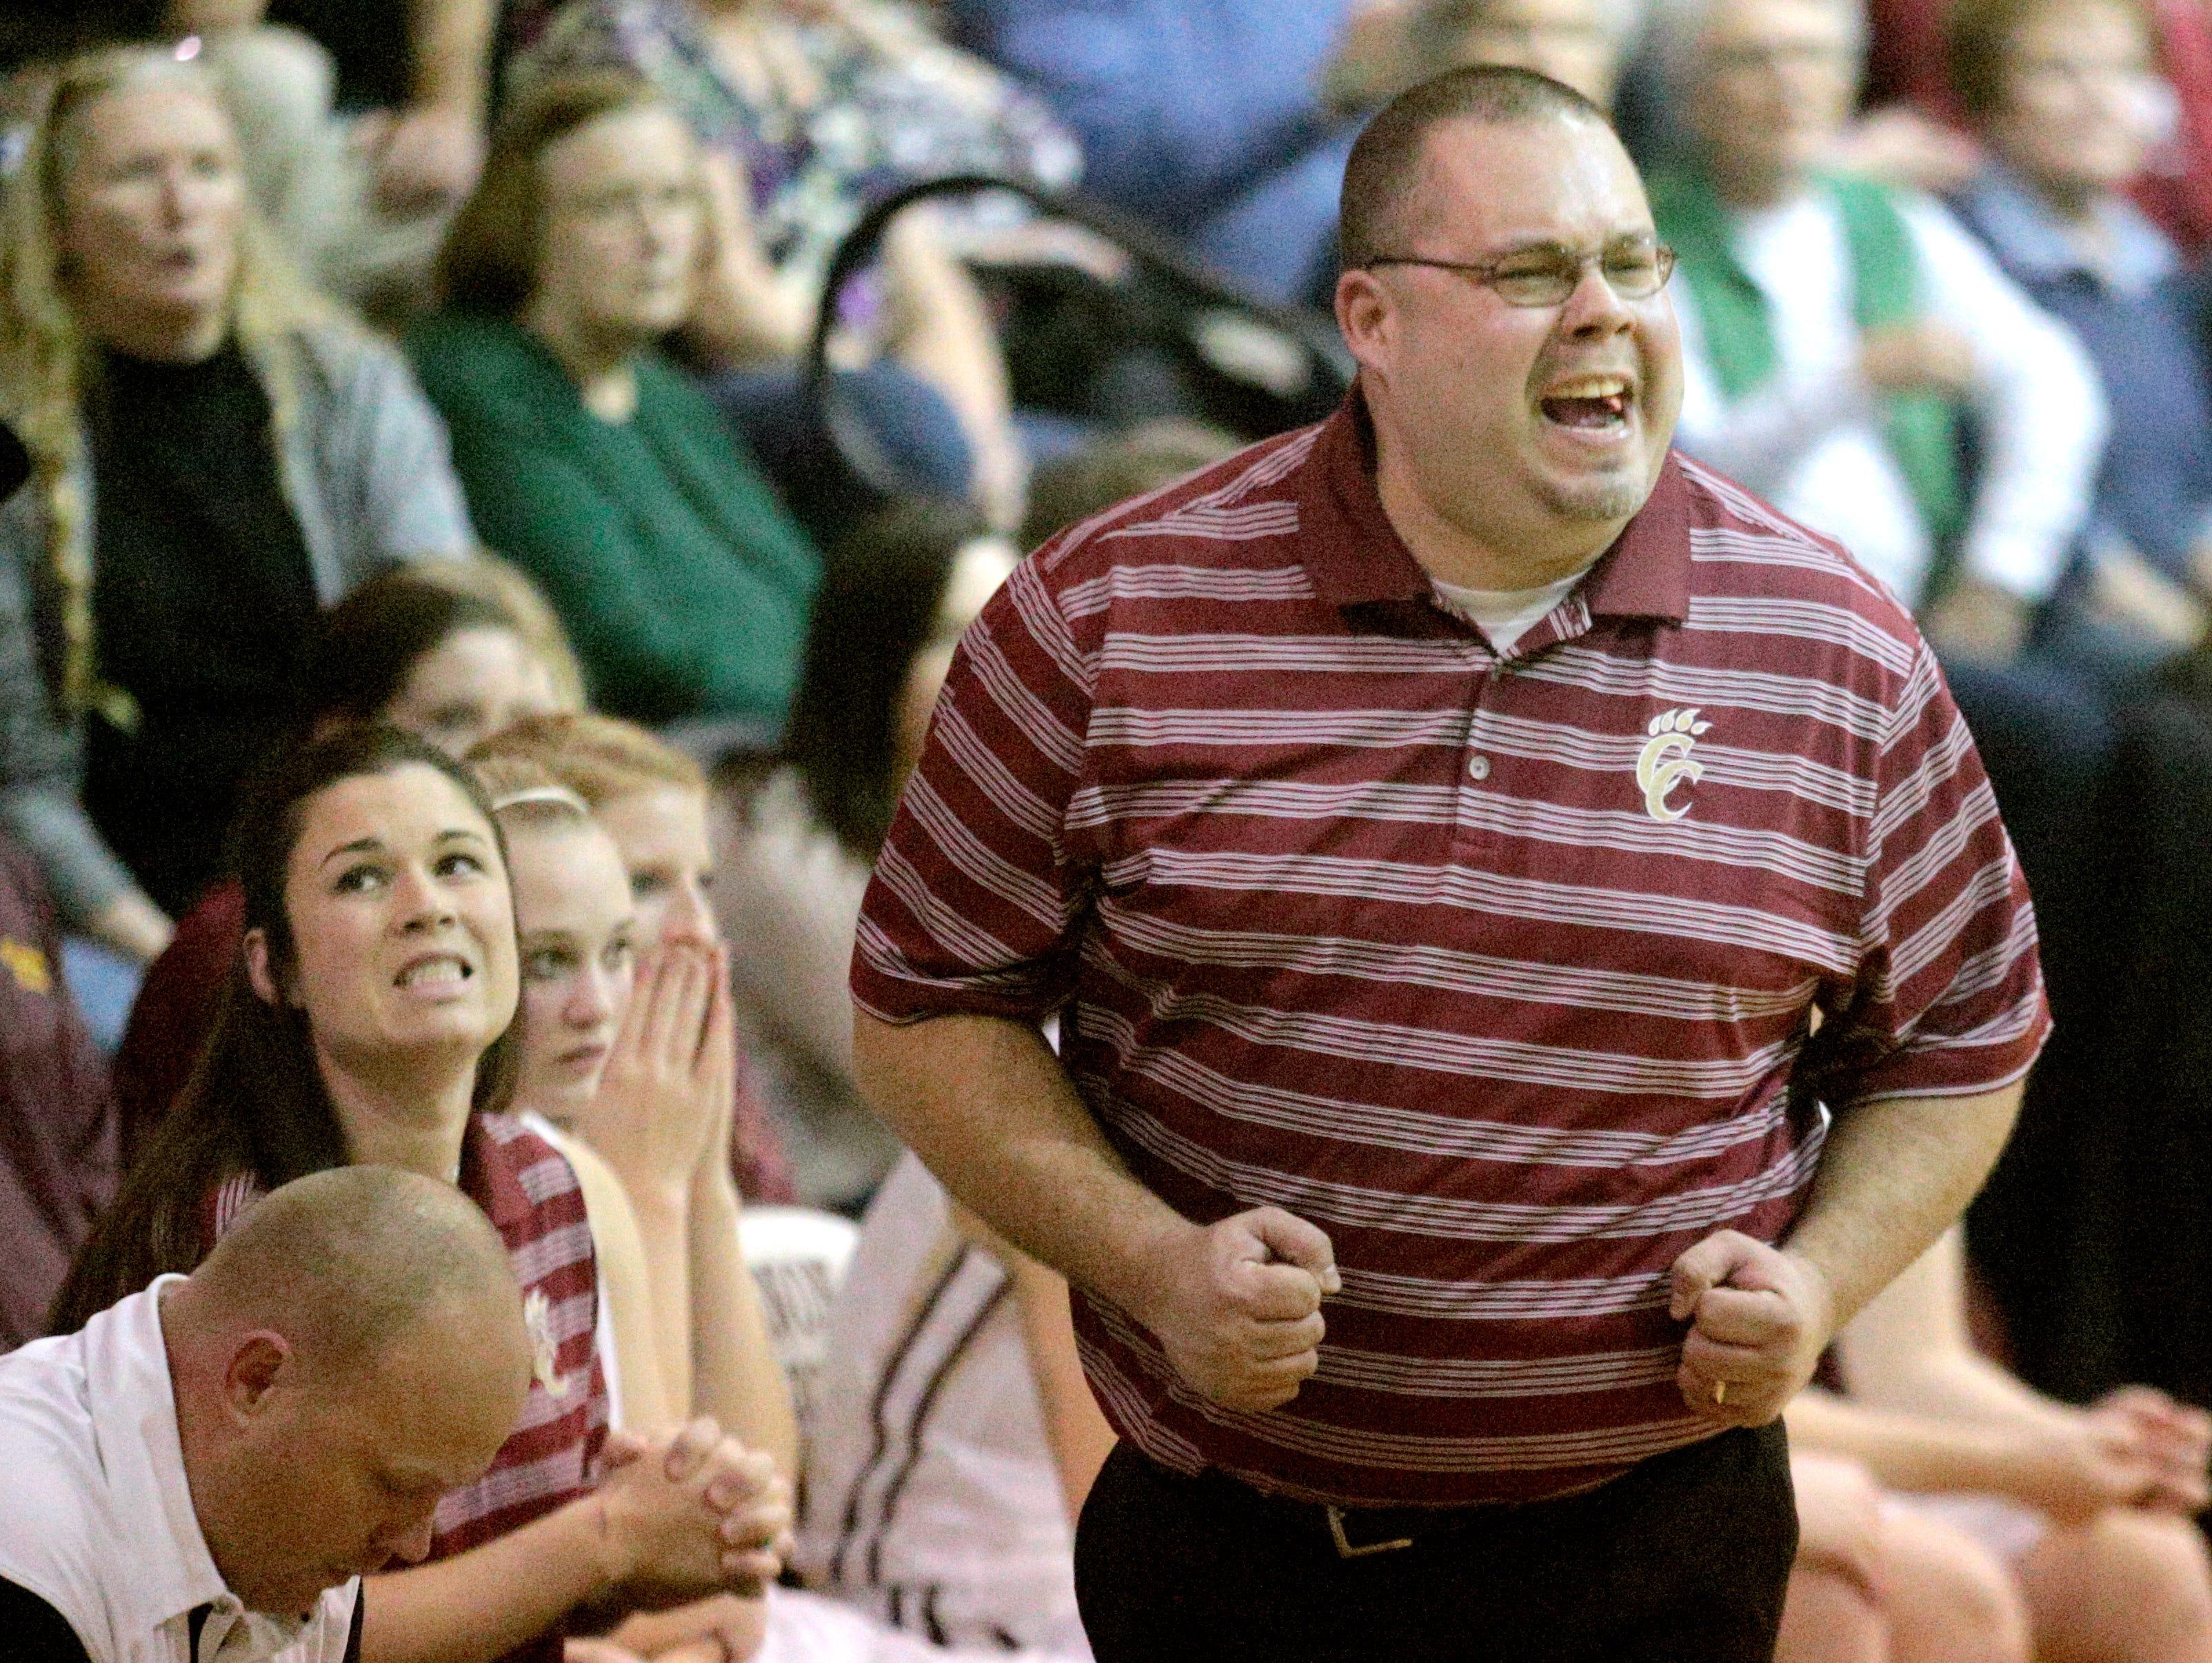 Michael Dodgen recently won his 300th game as a head coach.